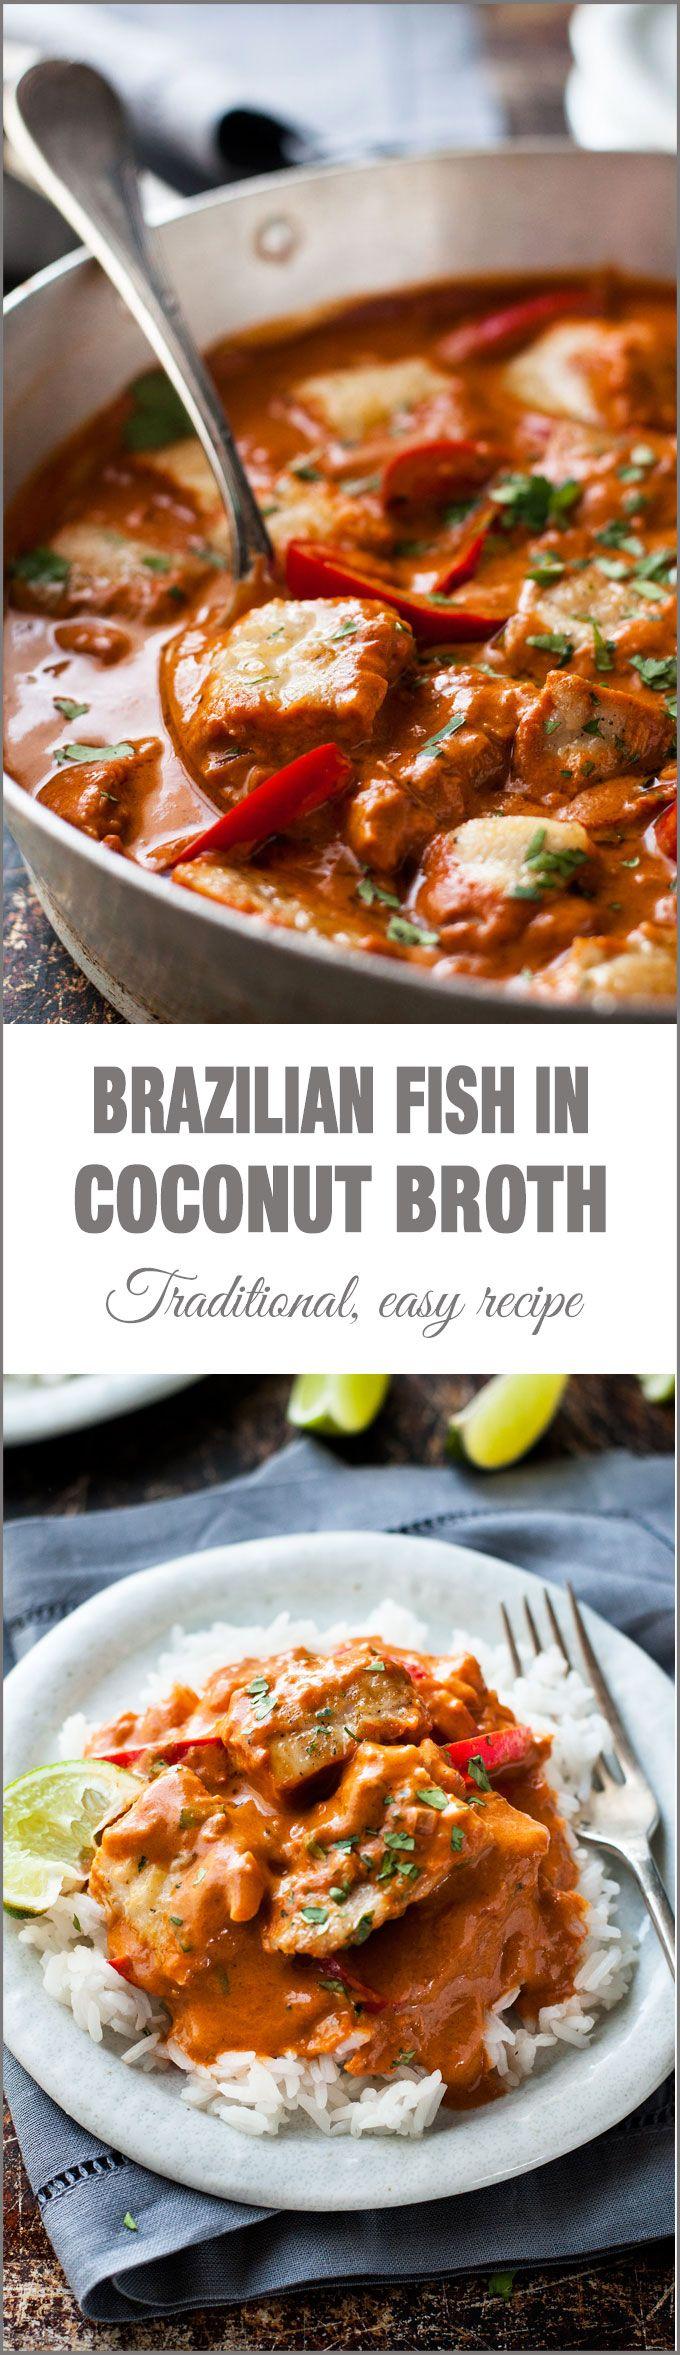 105 best brazilian food images on pinterest cooking food brazilian fish stew moqueca baiana forumfinder Images